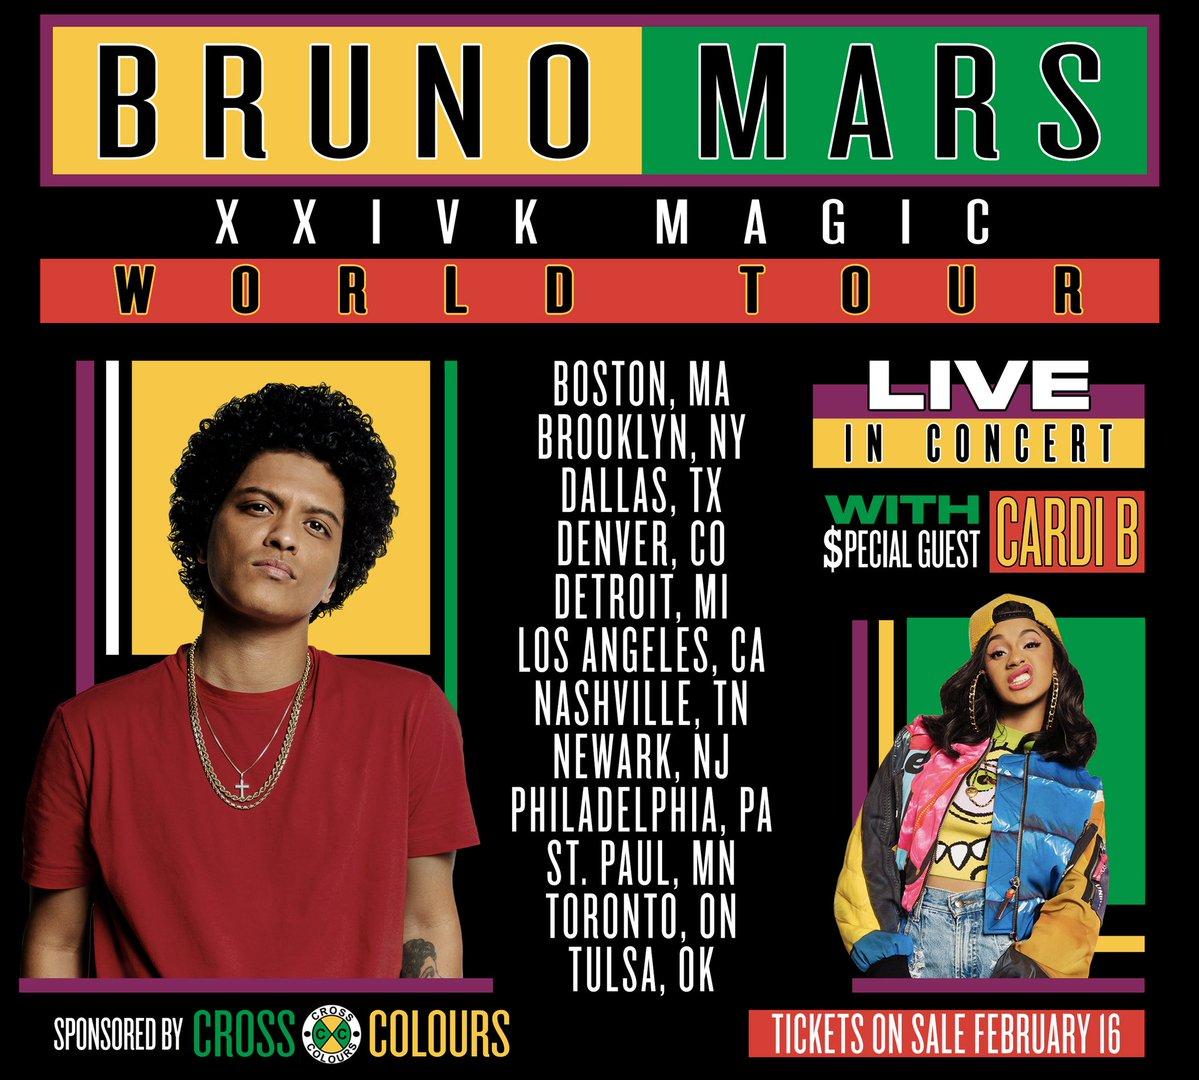 Bruno mars tour dates in Brisbane